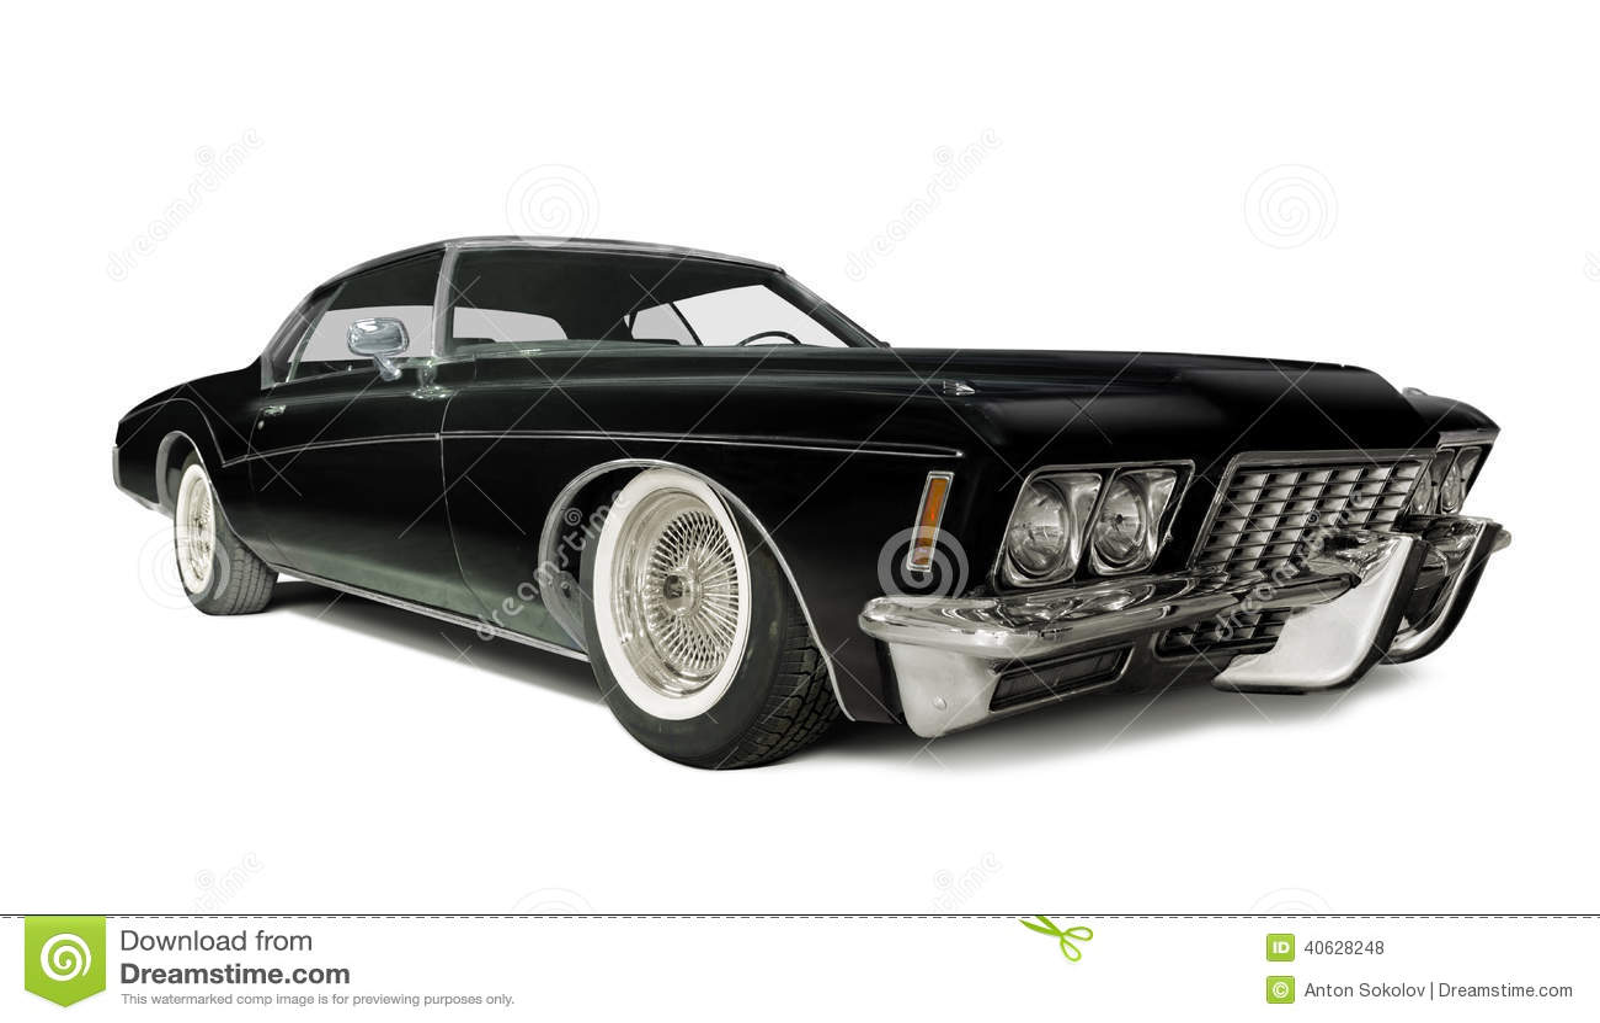 Buick Riviera 1972 Stock Photo - Image: 40628248